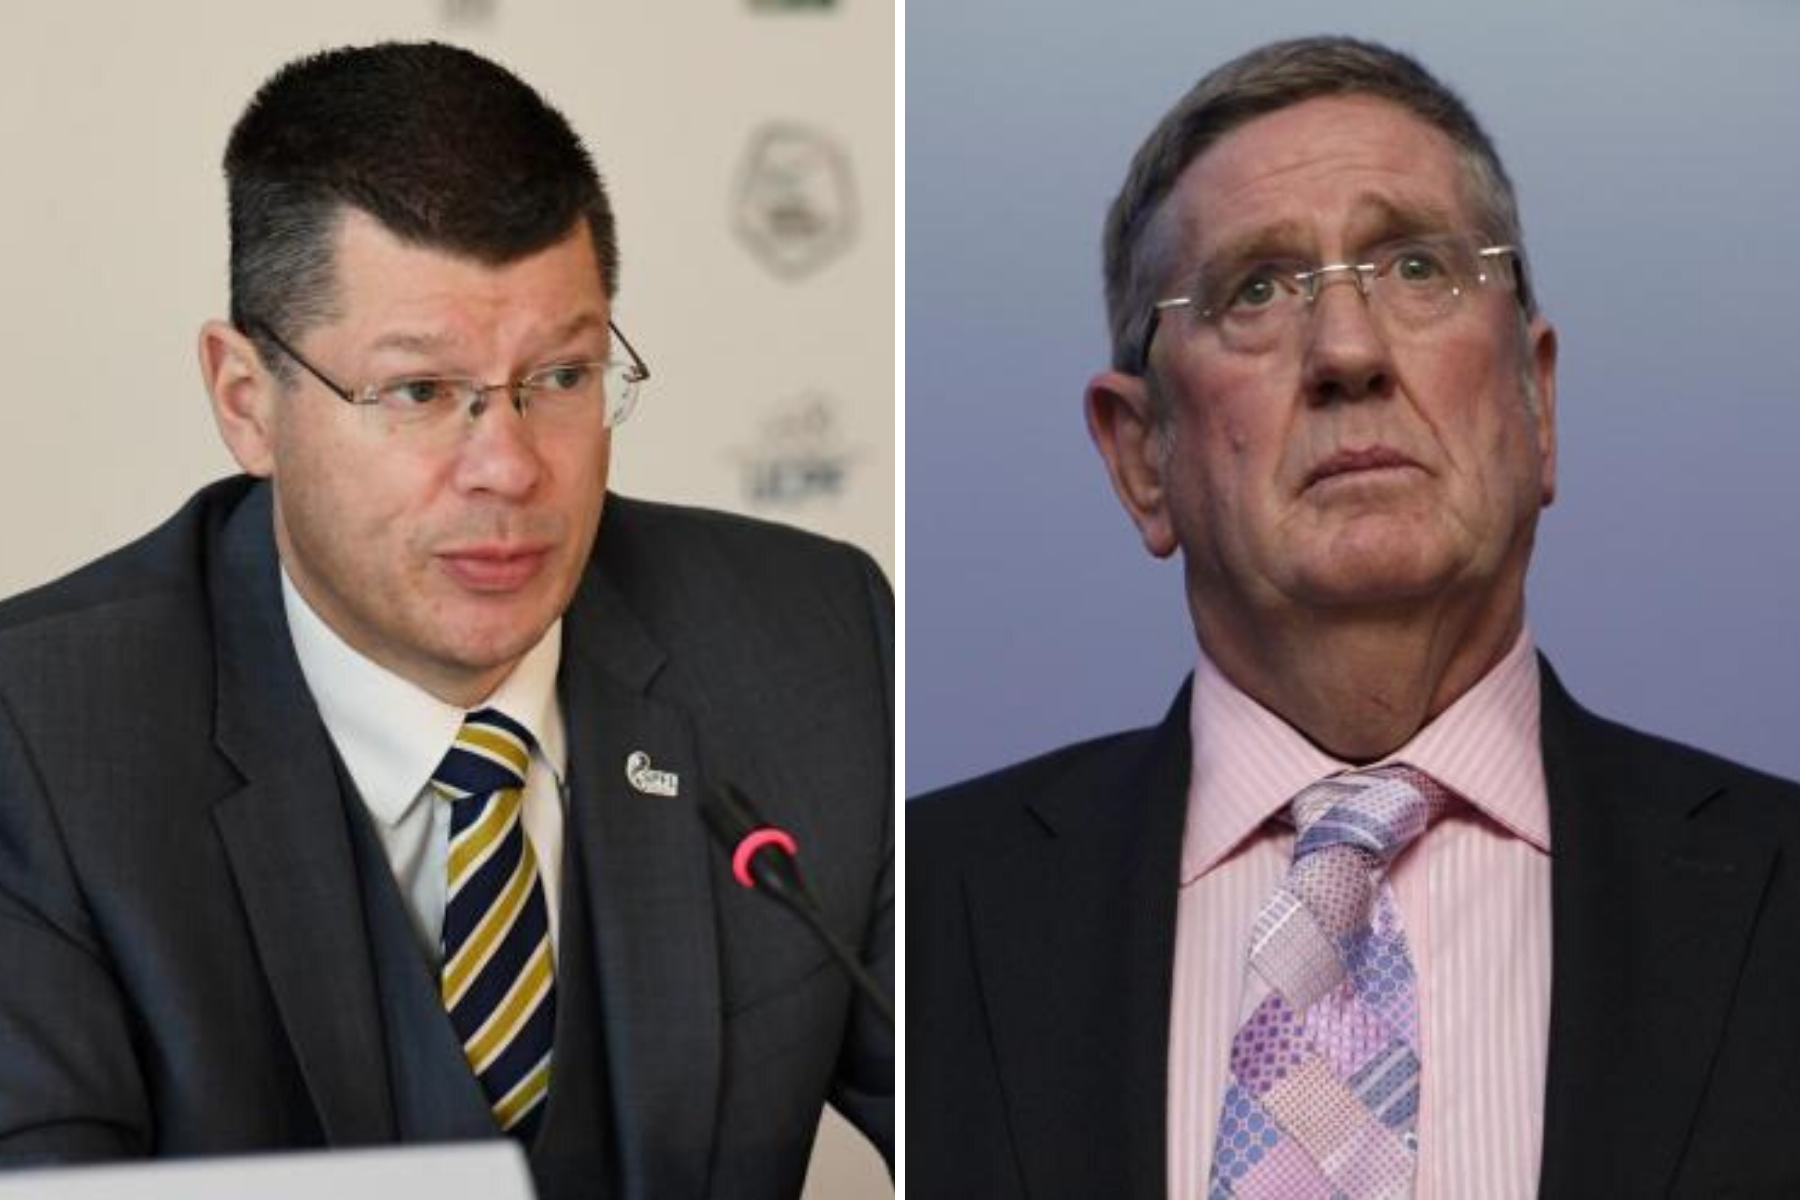 SPFL claim Rangers chairman Douglas Park made 'threat' towards Neil Doncaster